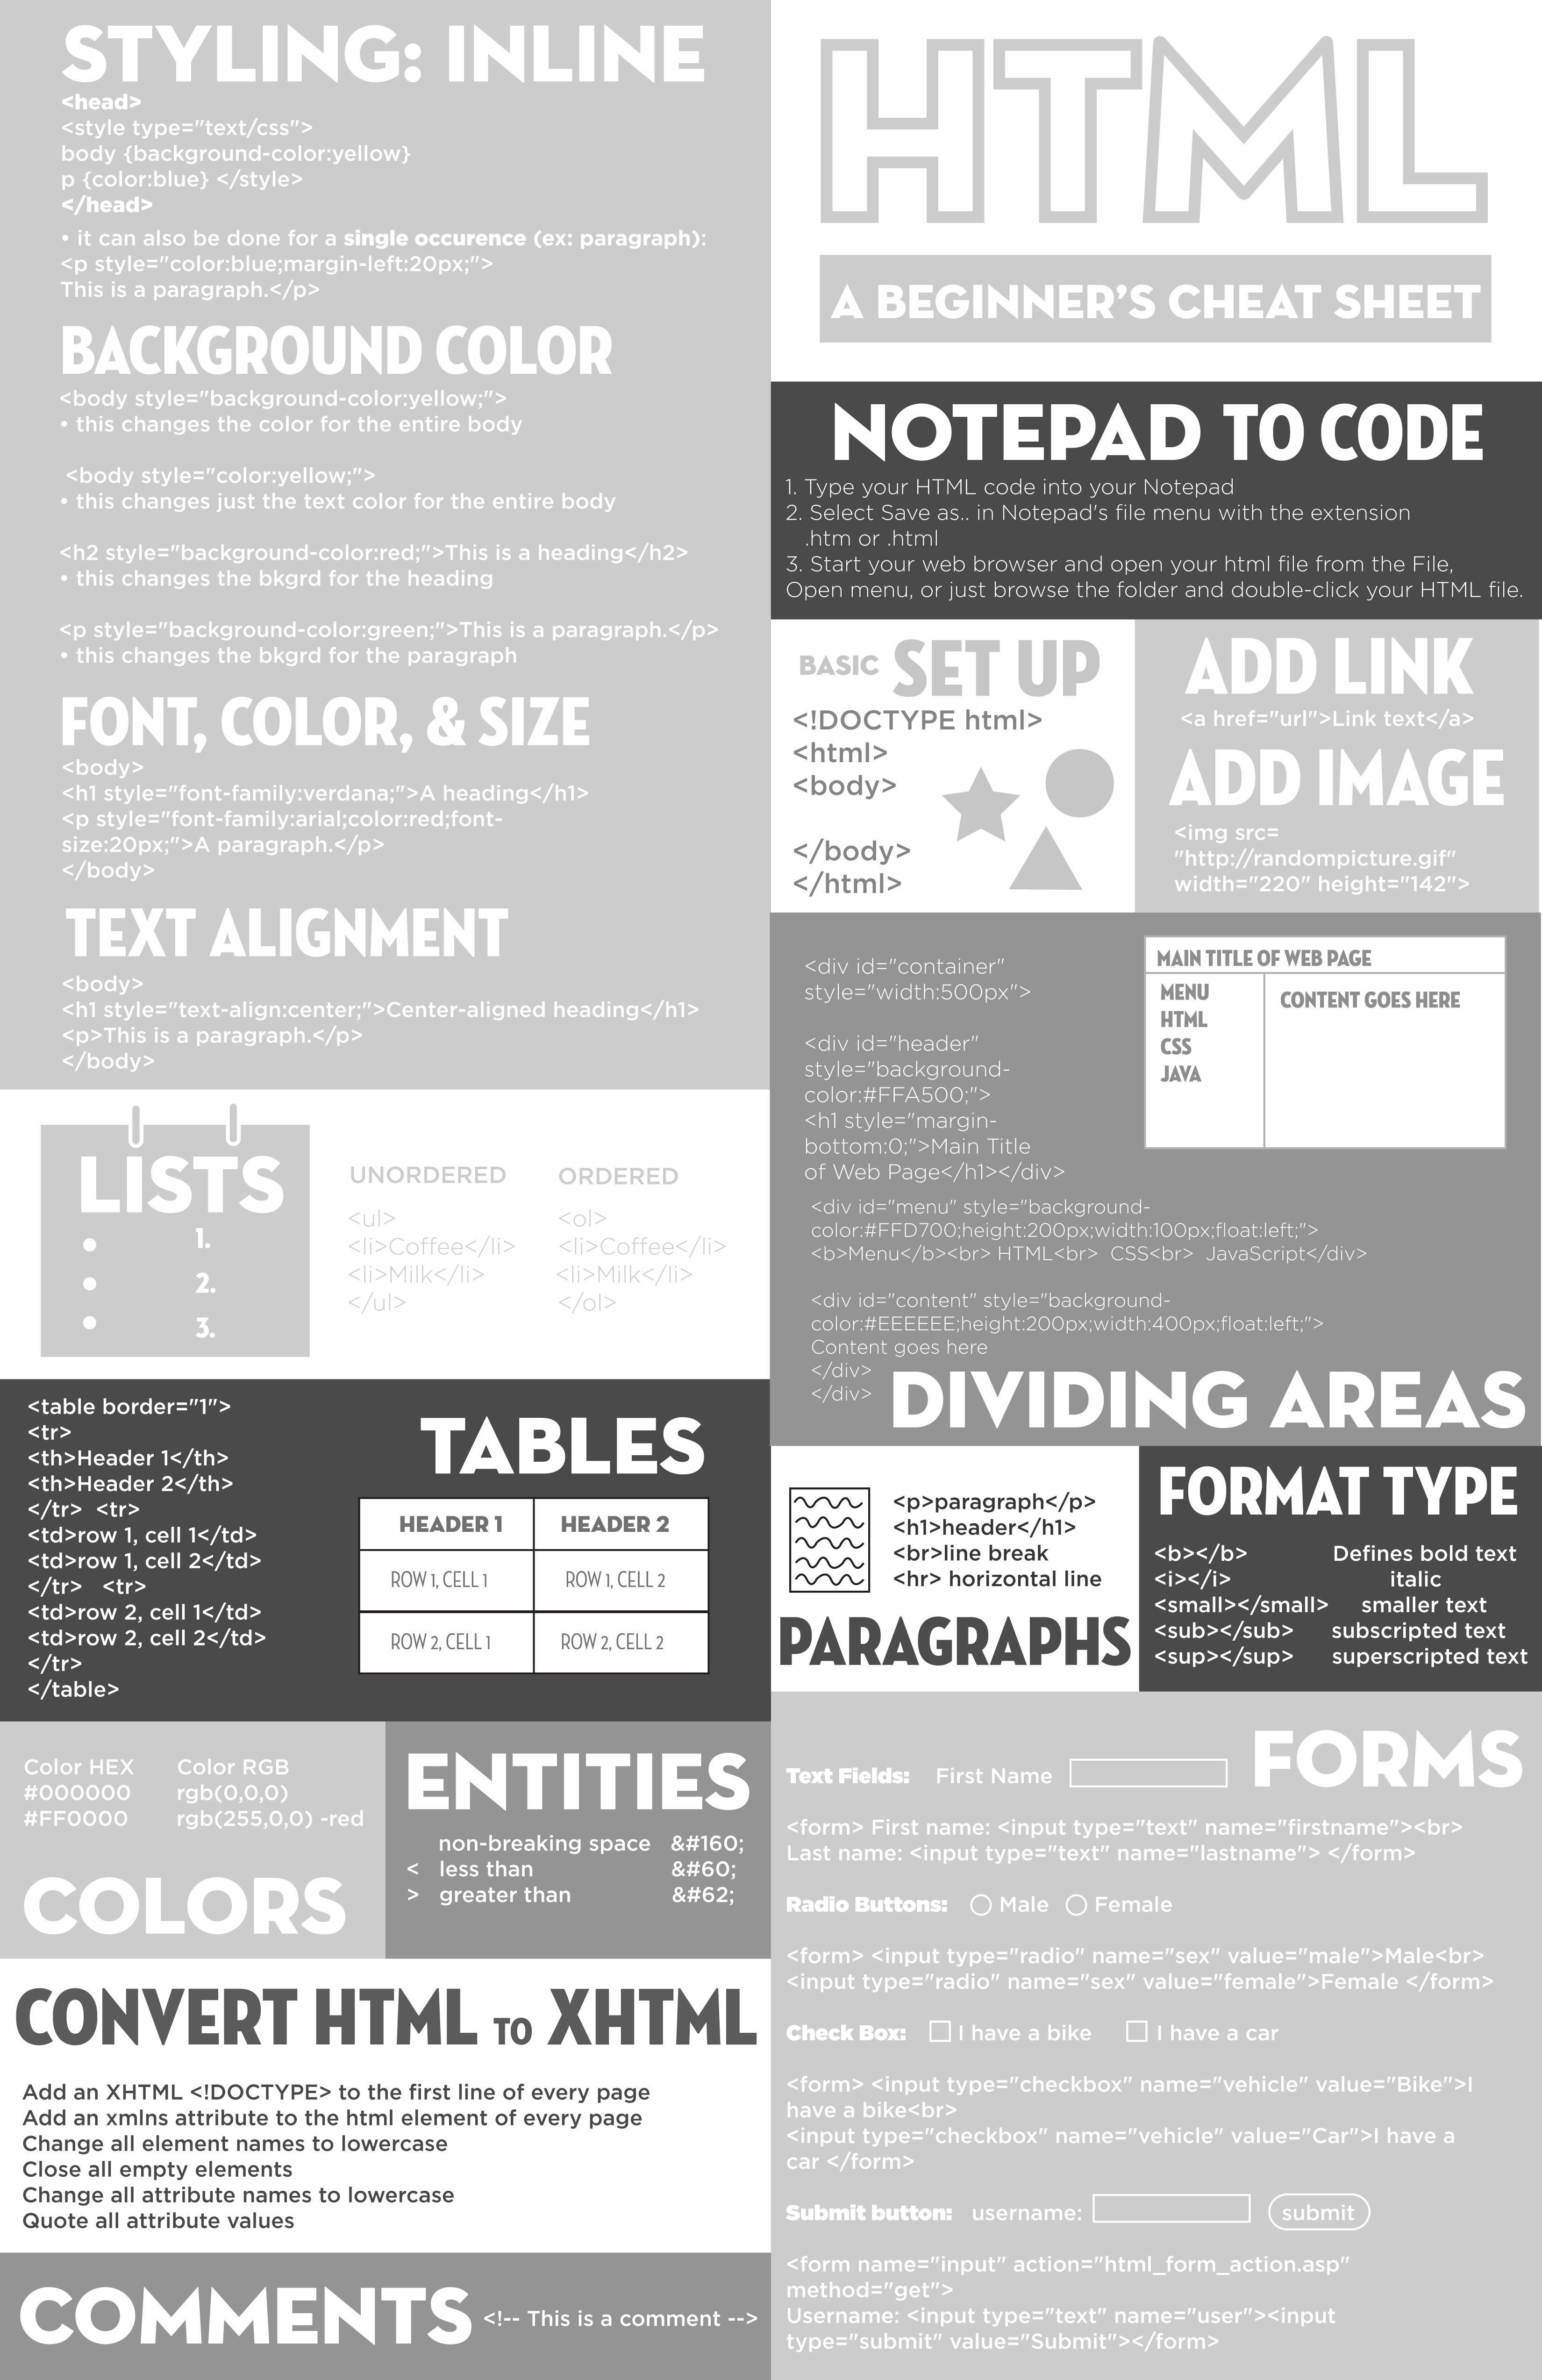 A Cheat Sheet I Designed For Beginner Coding Html Web Design Tips Web Design Quotes Coding